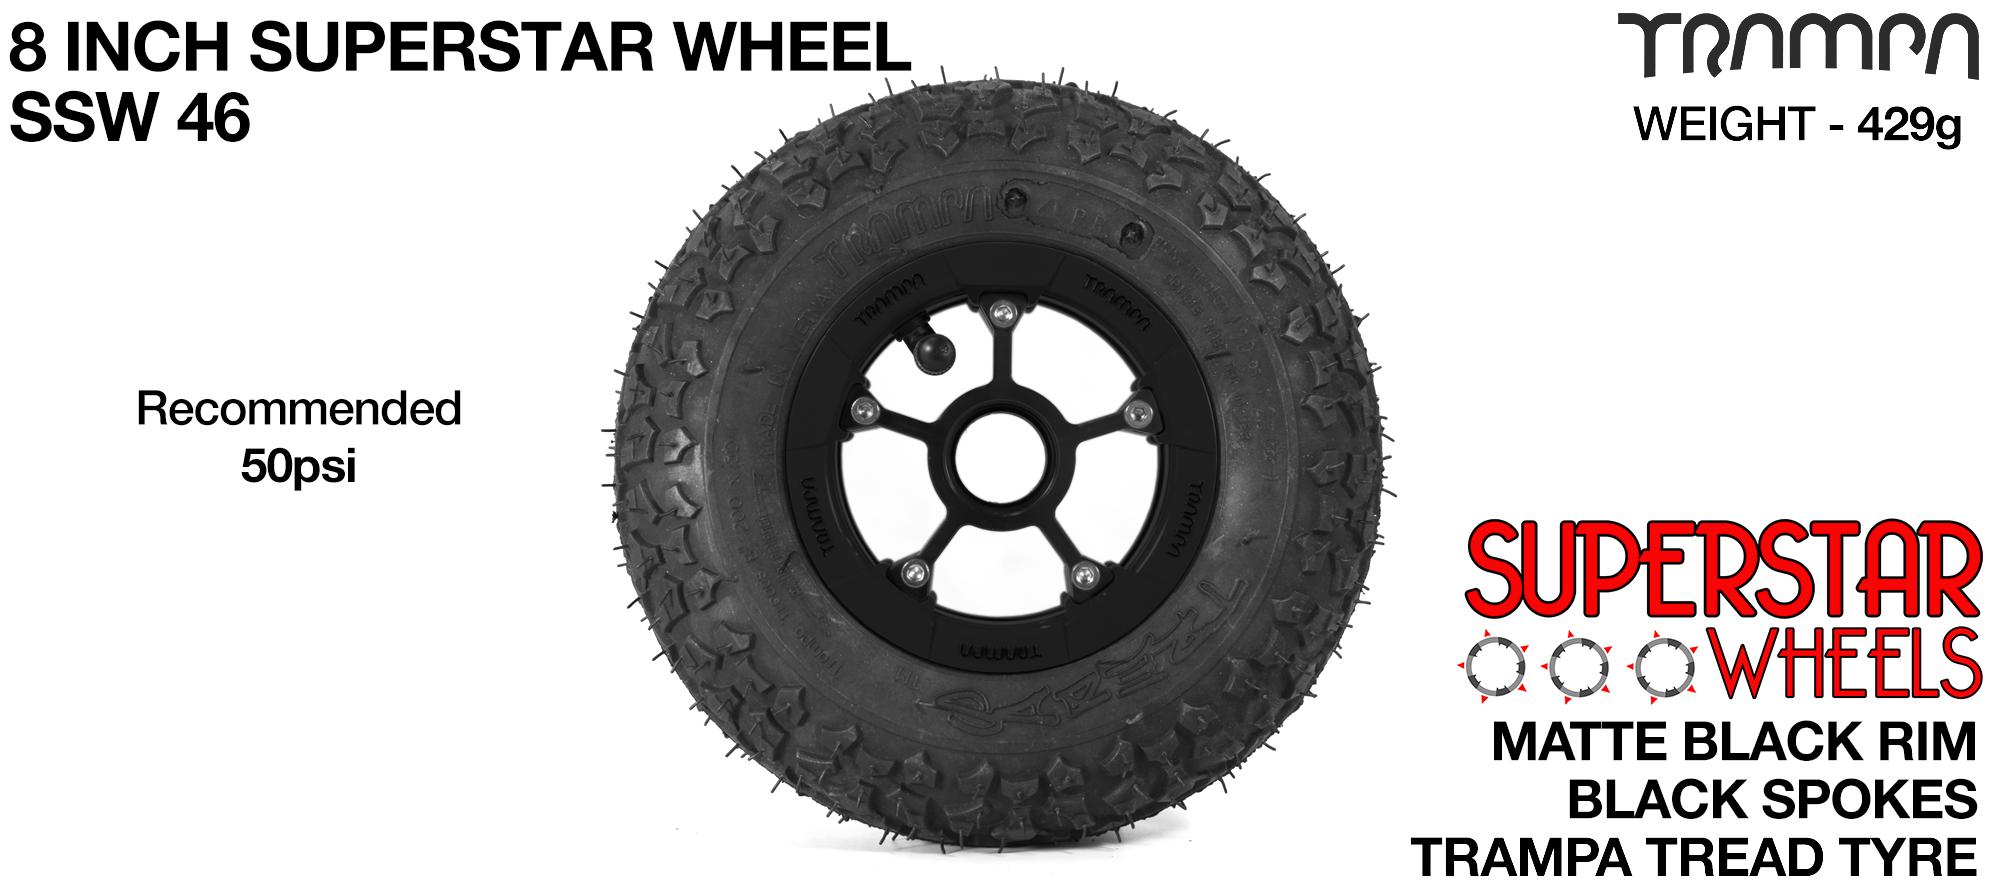 Superstar 8 inch wheel - Matt Black Rim with Black Anodised spokes & TRAMPA TREAD 8 Inch Tyres